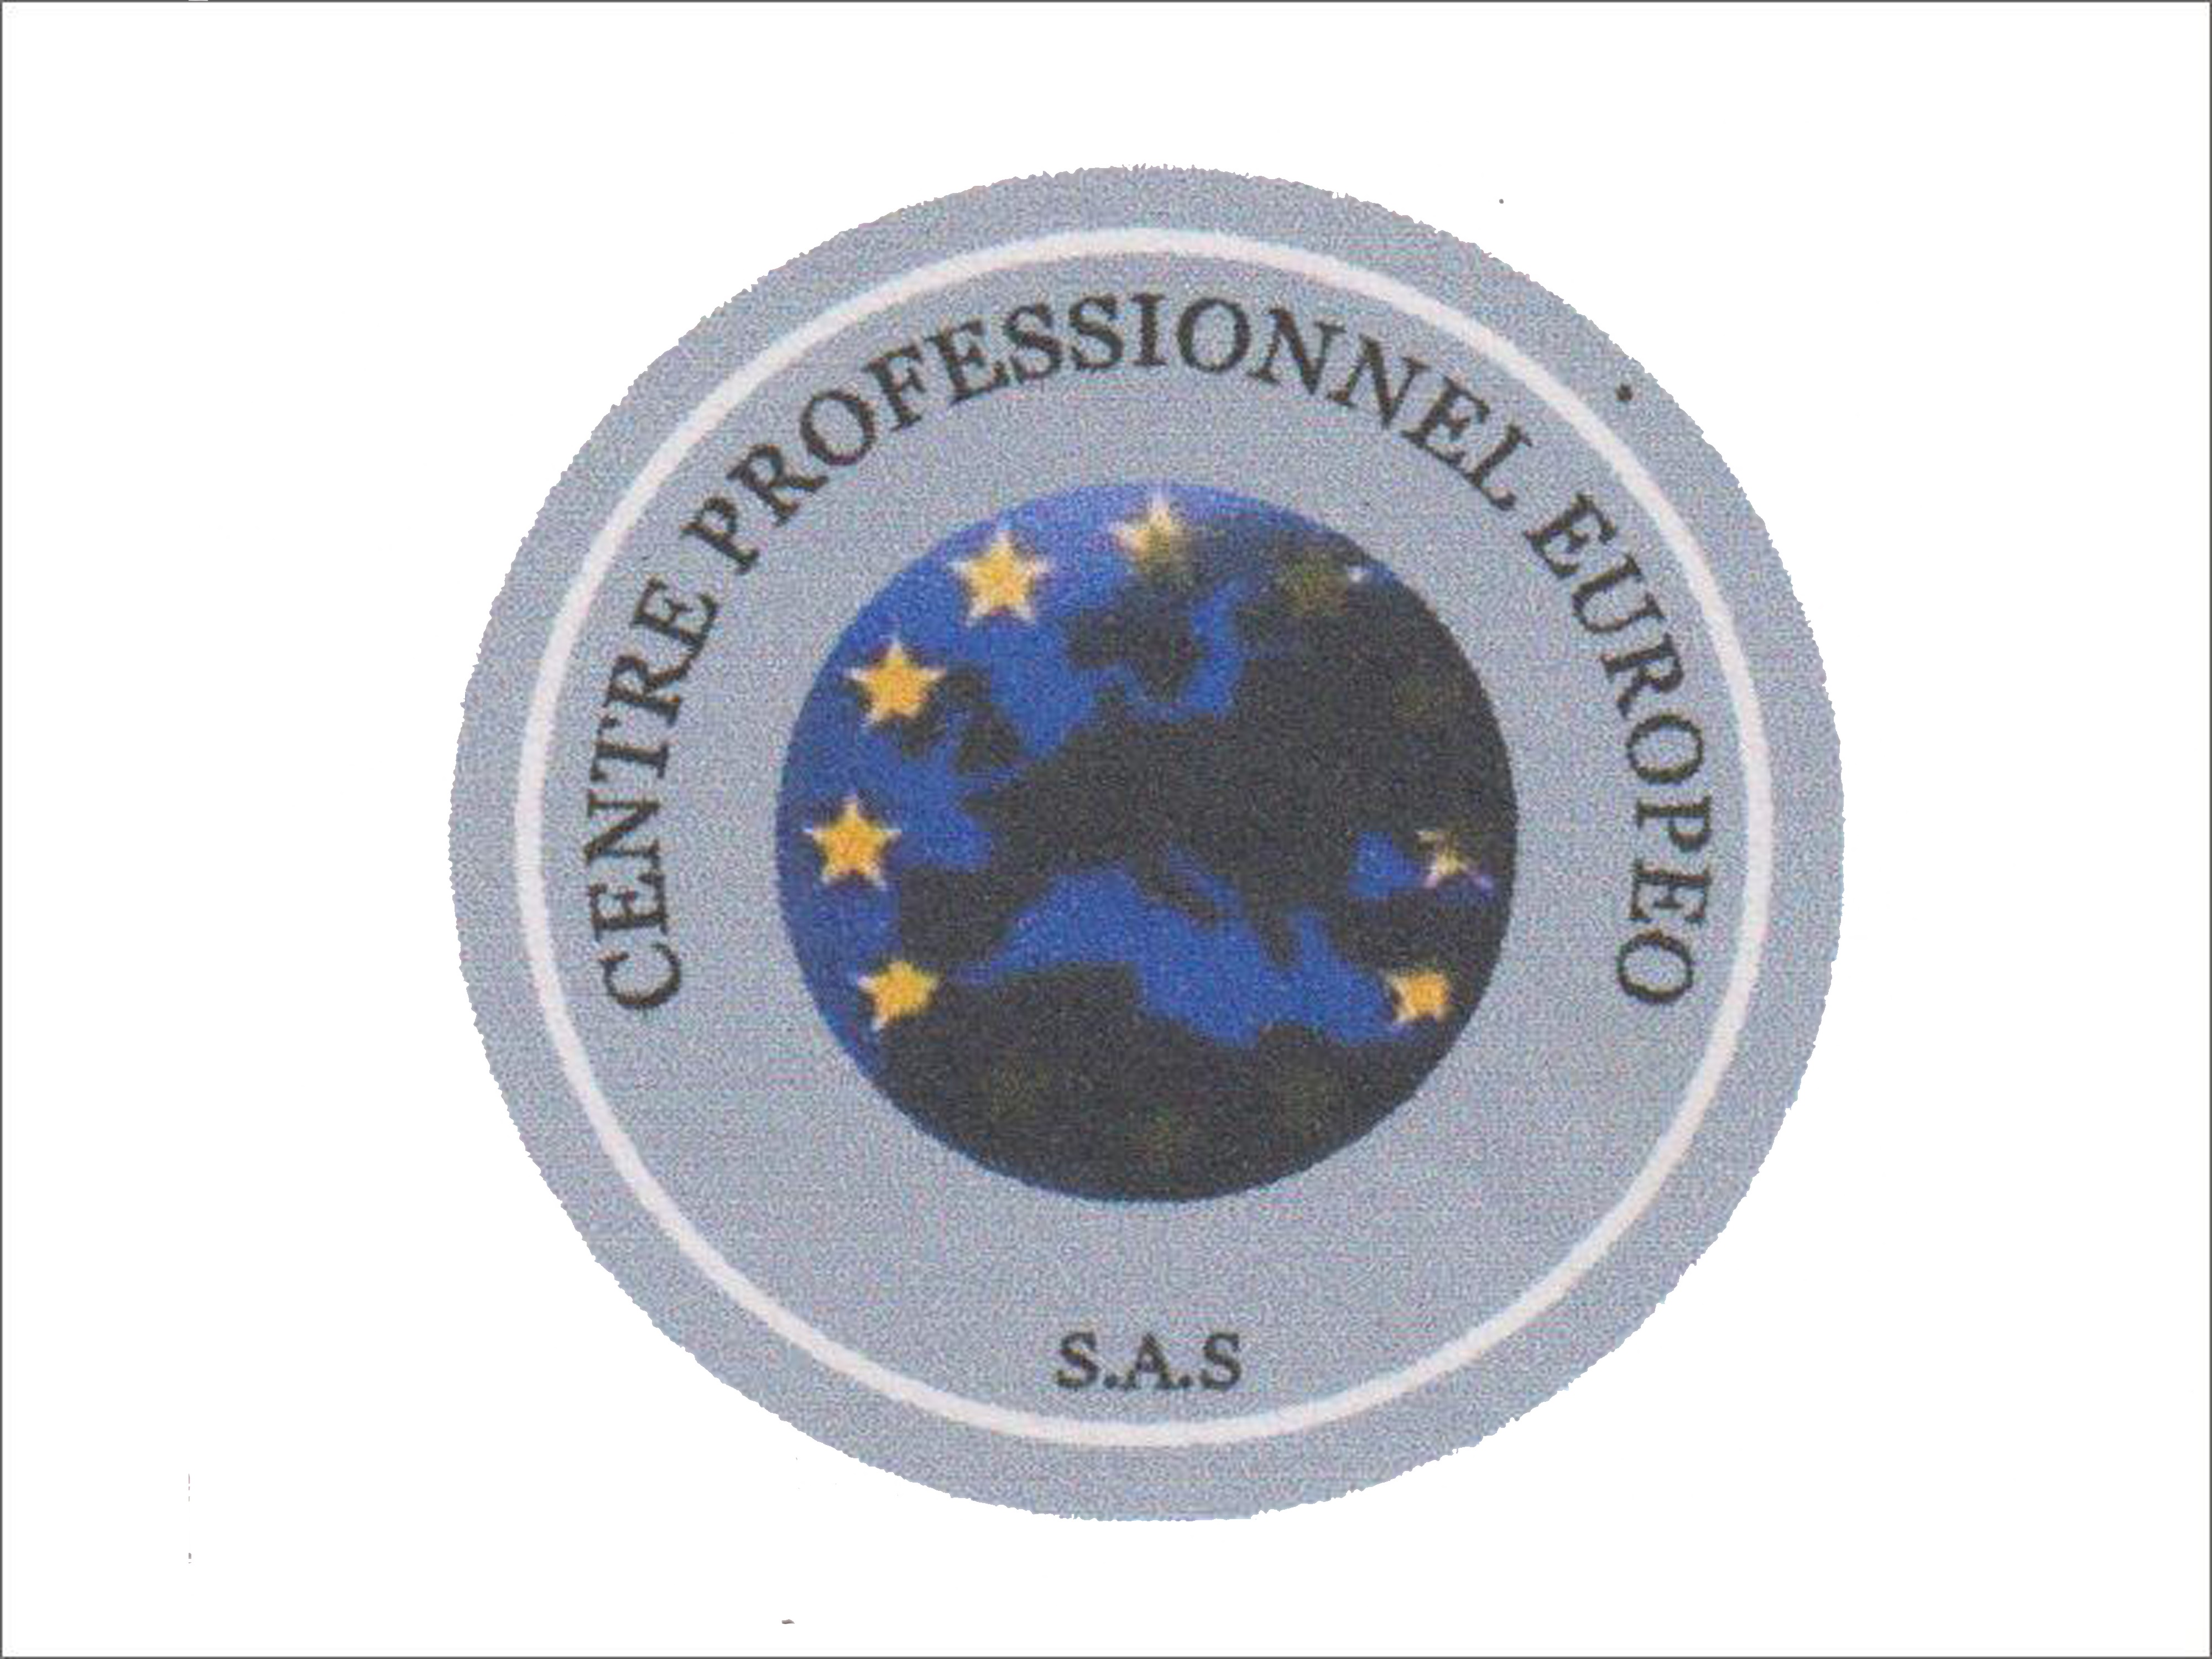 Centre Professionnel Europeo Sas